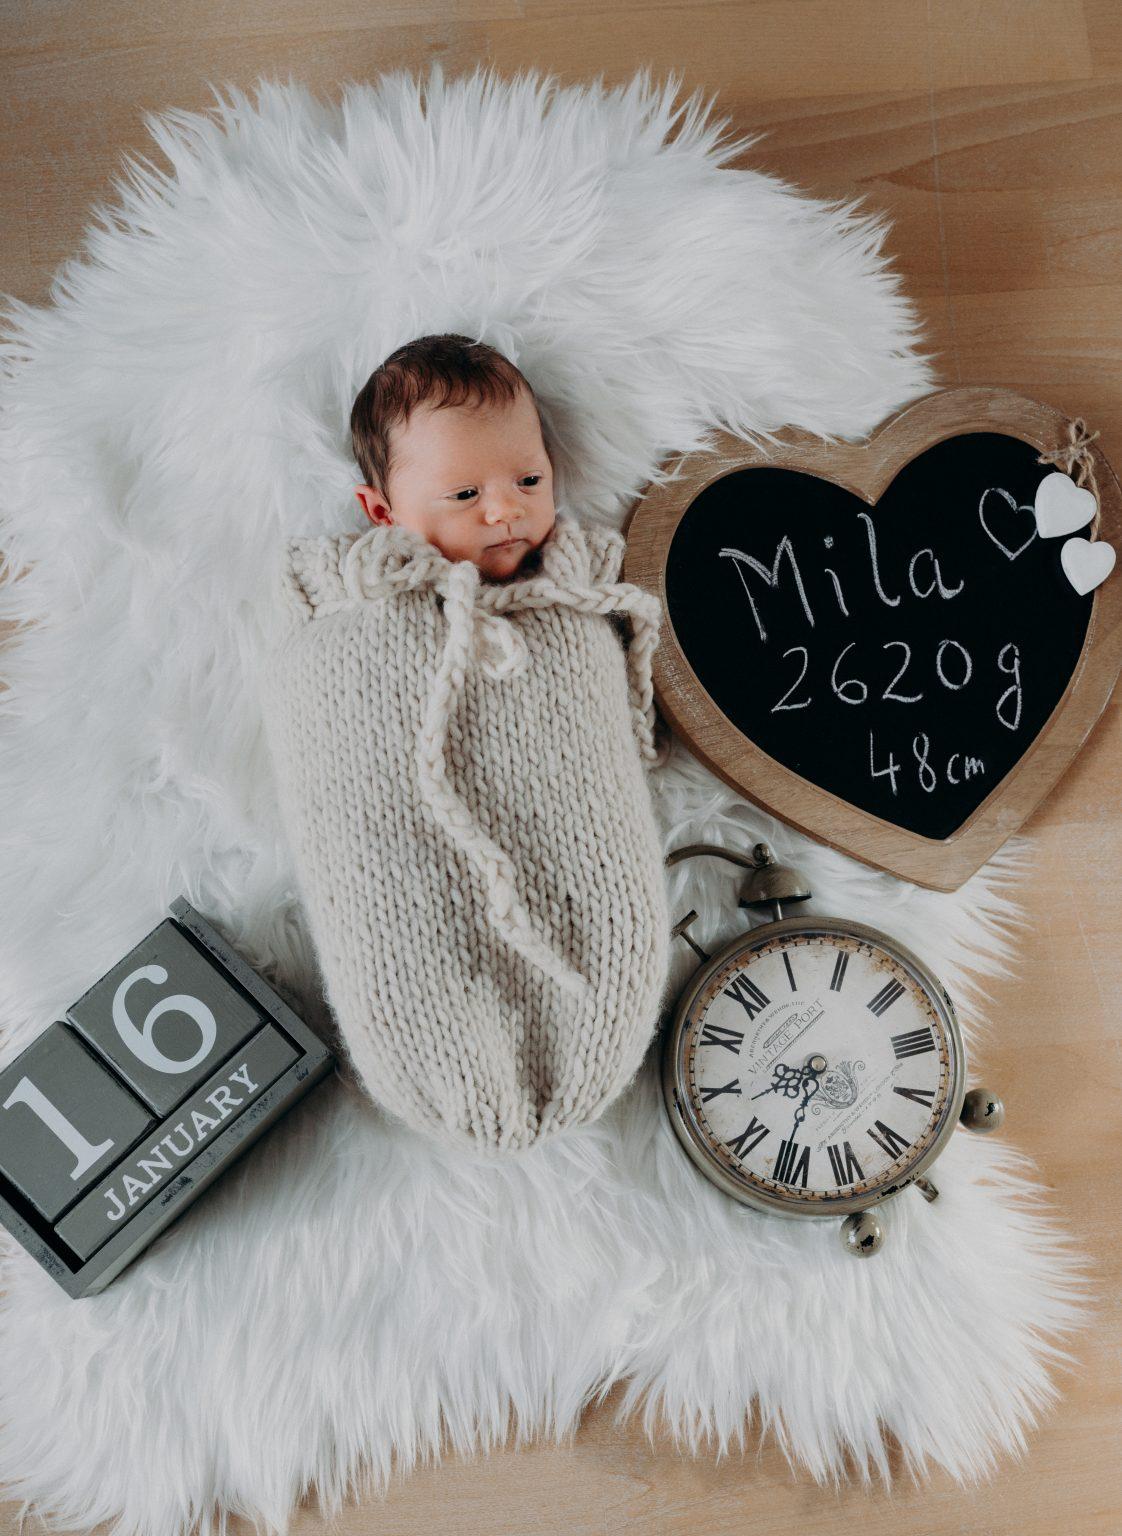 Babyfotografie, Neugeborenen Fotografie, Familie, Neugeborene